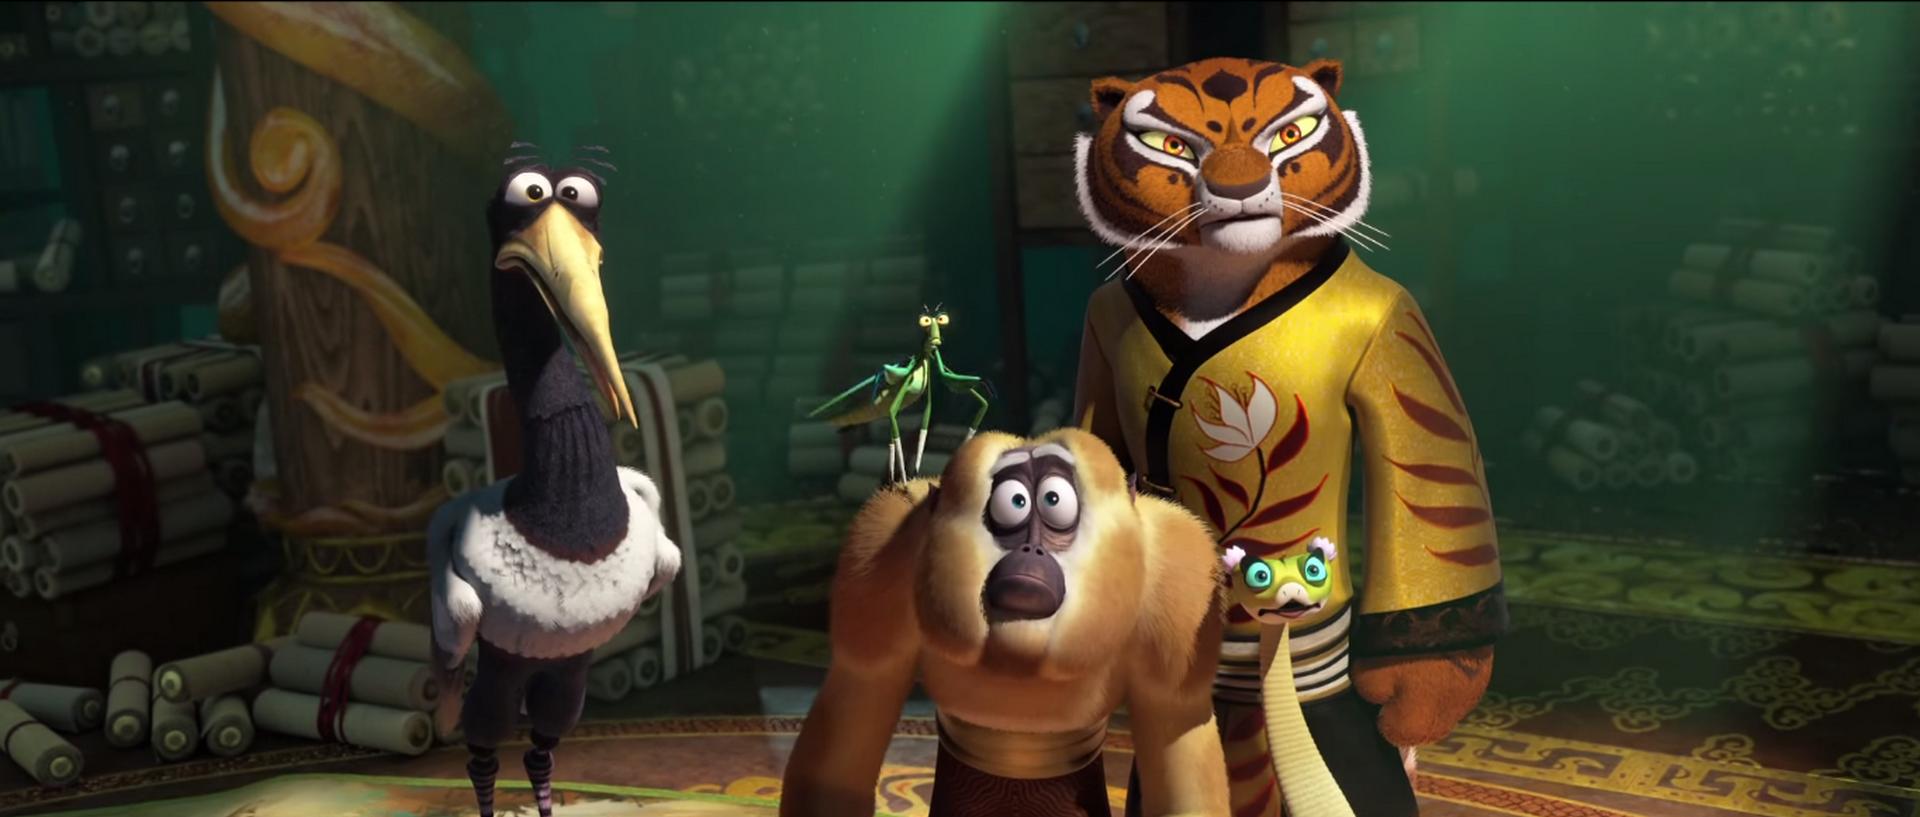 kung fu panda legends of awesomeness images Tigress growling gif